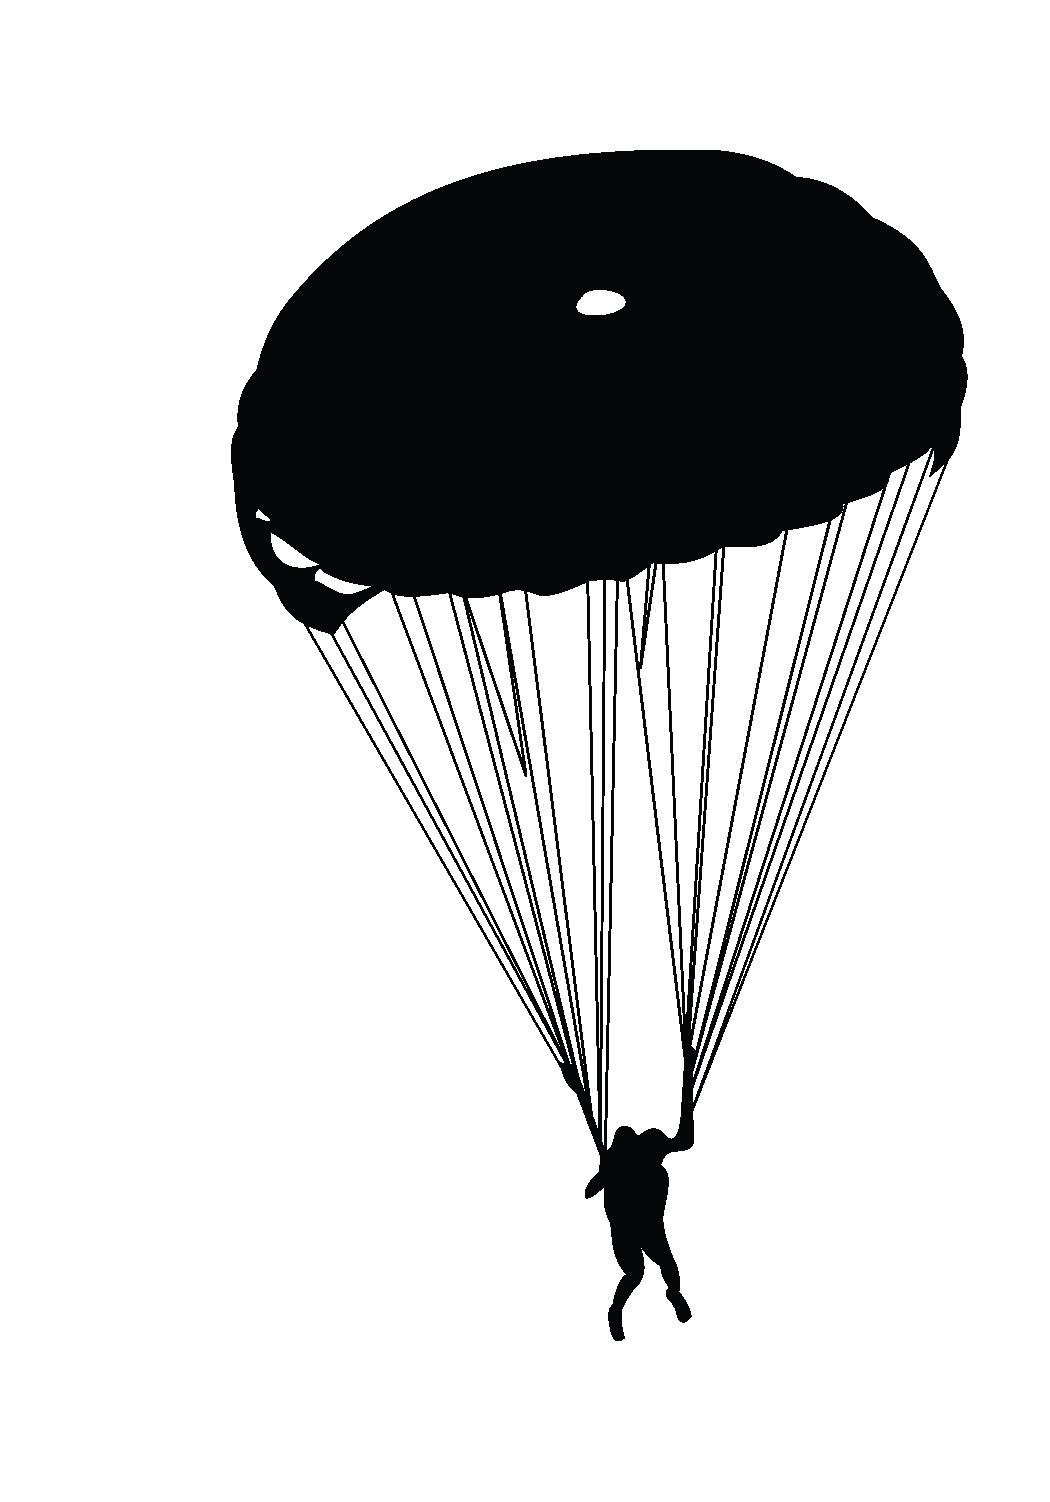 1050x1502 Parachute Silhouette Parachuting